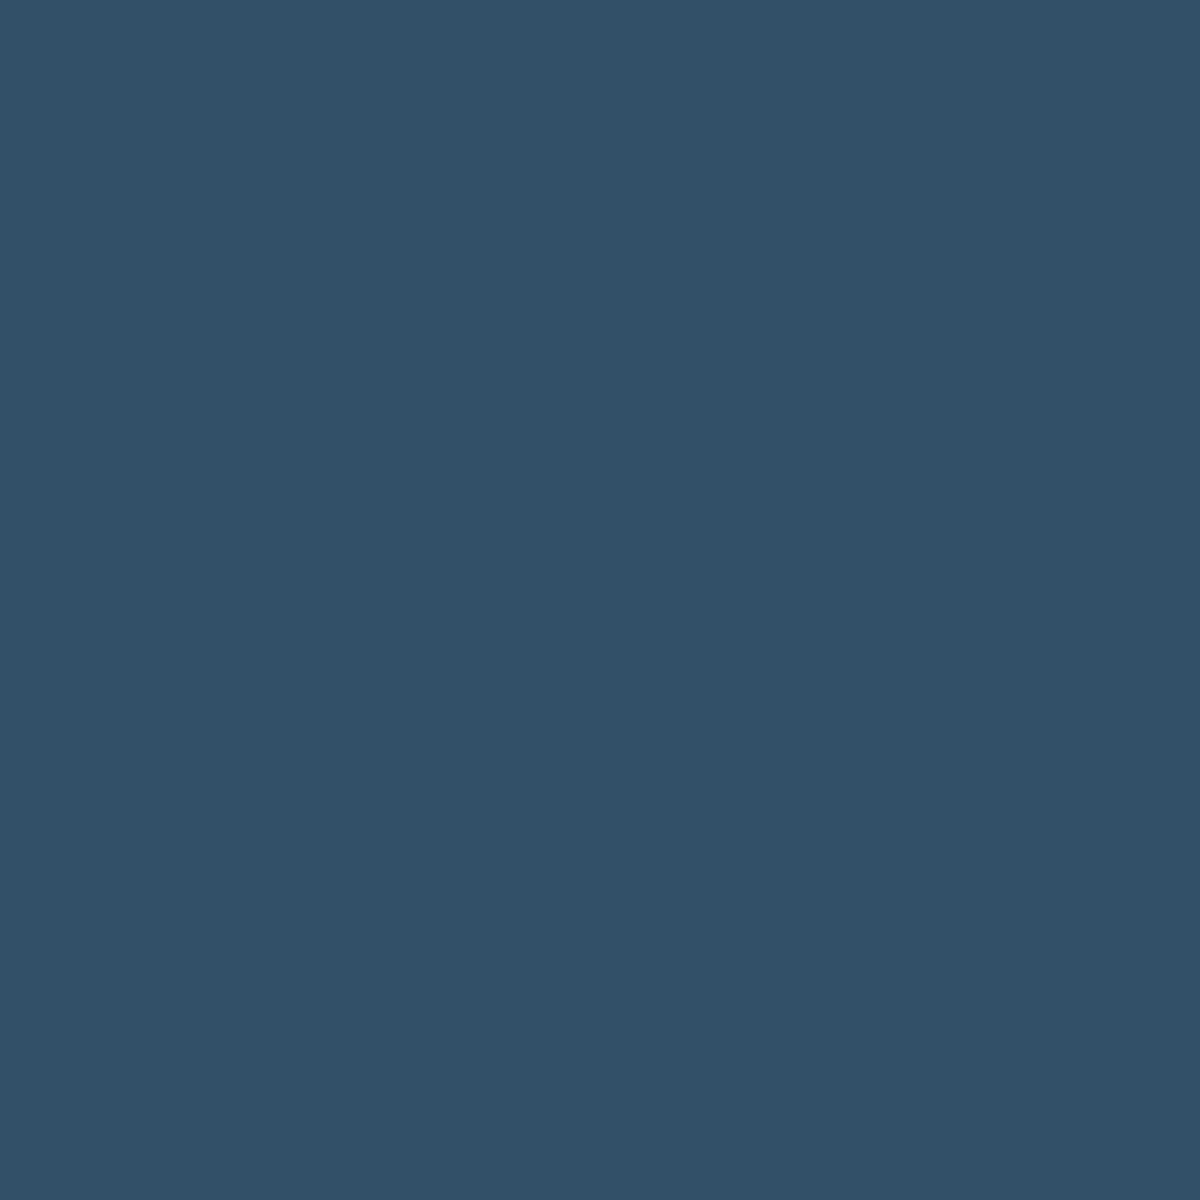 Albastru tirolez U504 ST9